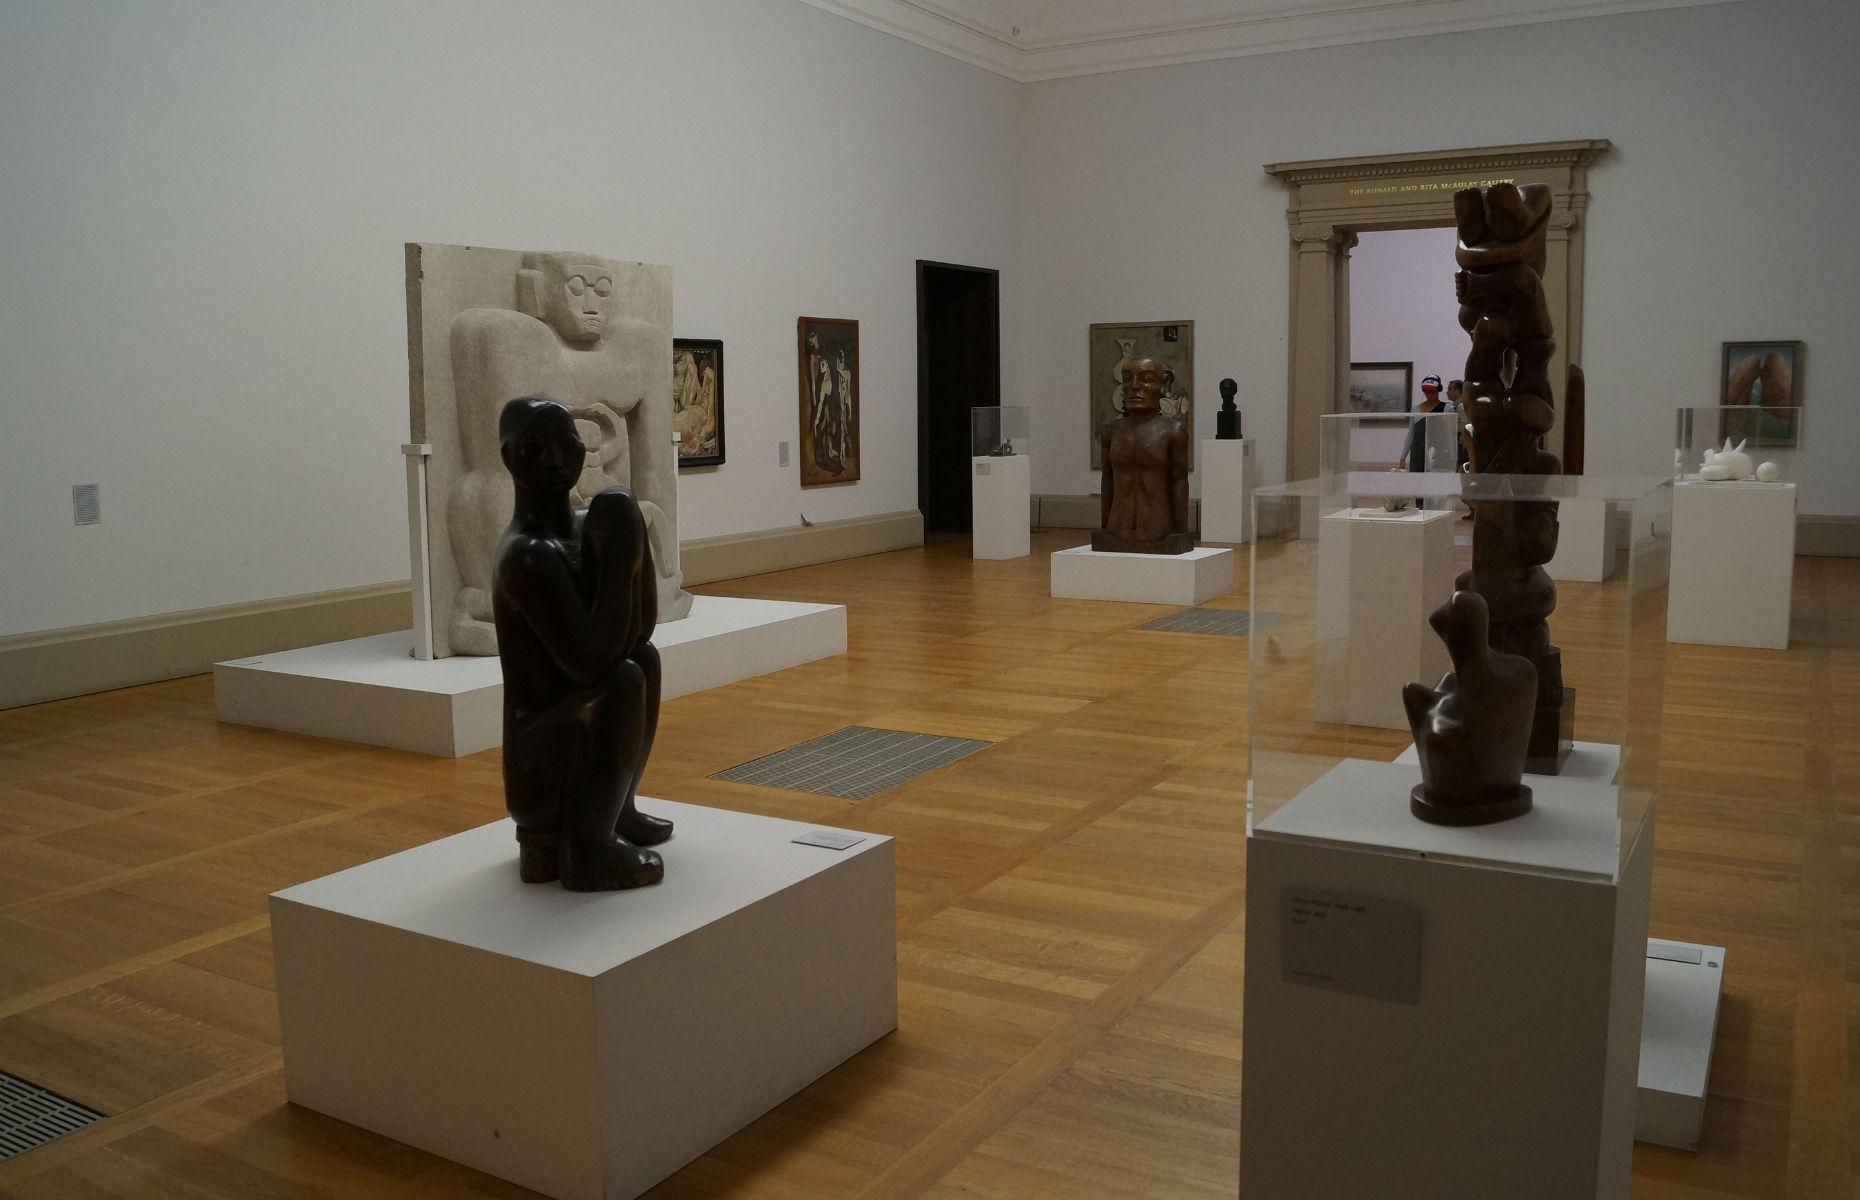 inside Tate Britain (Image: 3DF mediaStudio/Shutterstock)